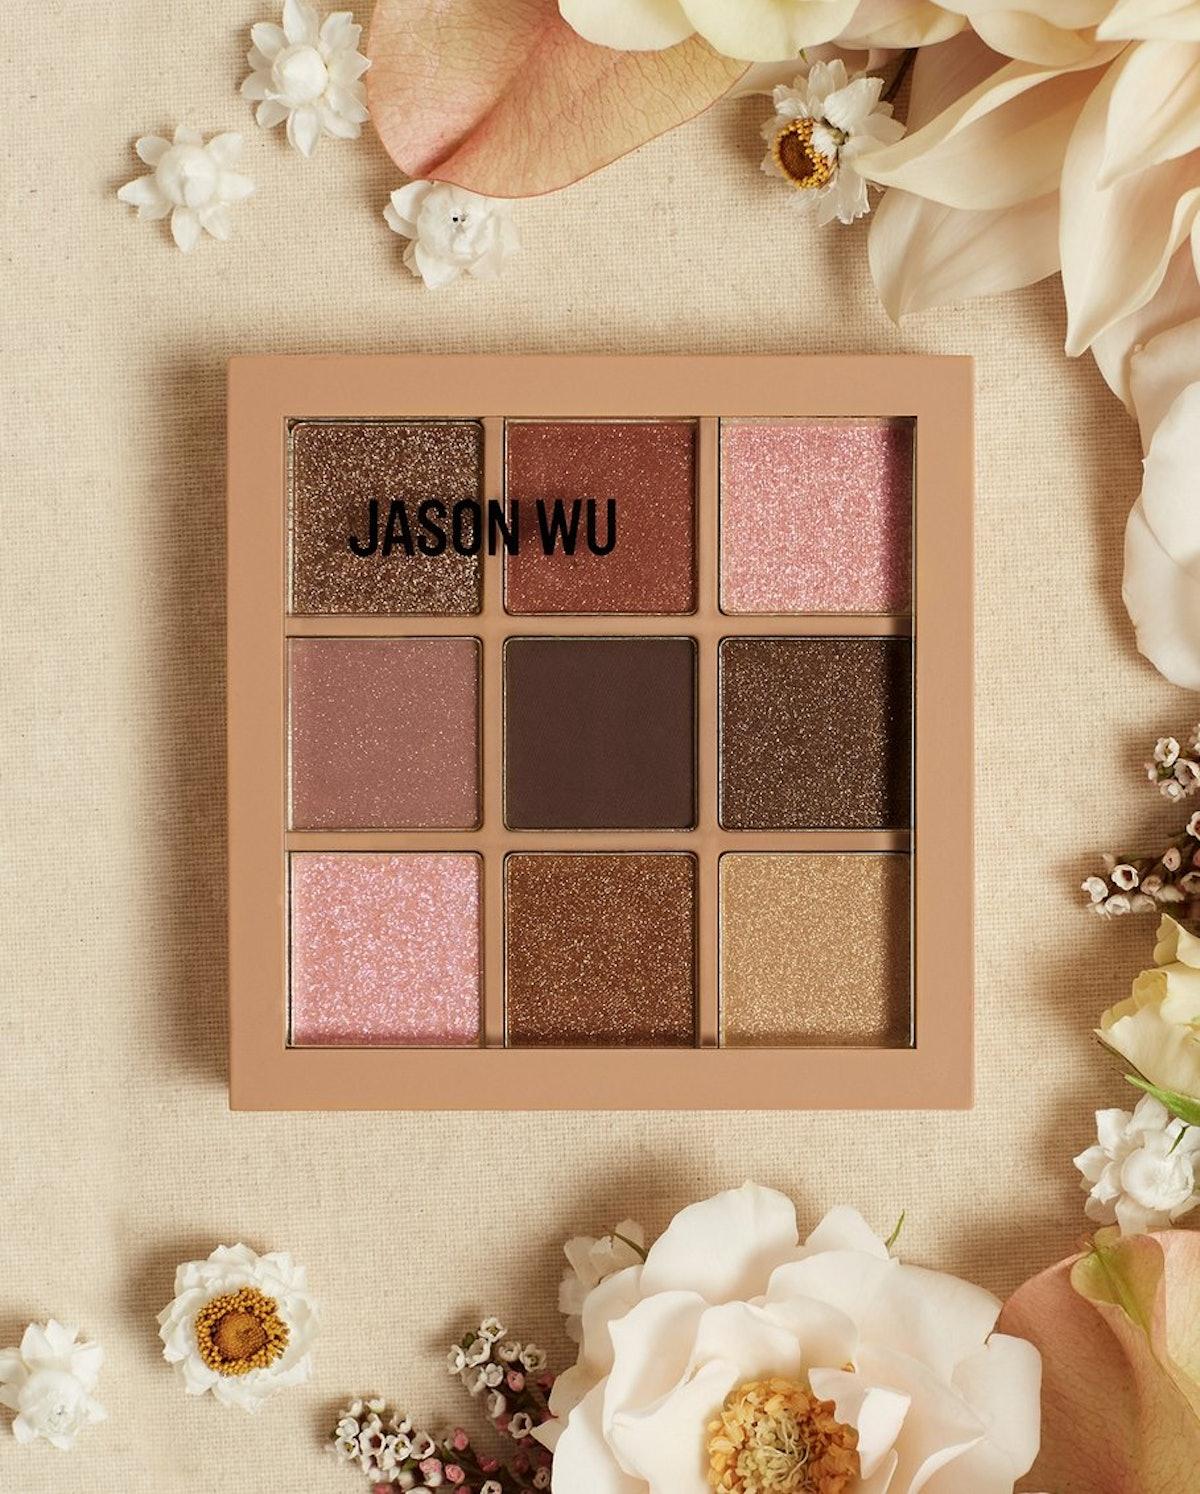 Jason Wu Beauty Flora 9 - 02 Prickly Pear